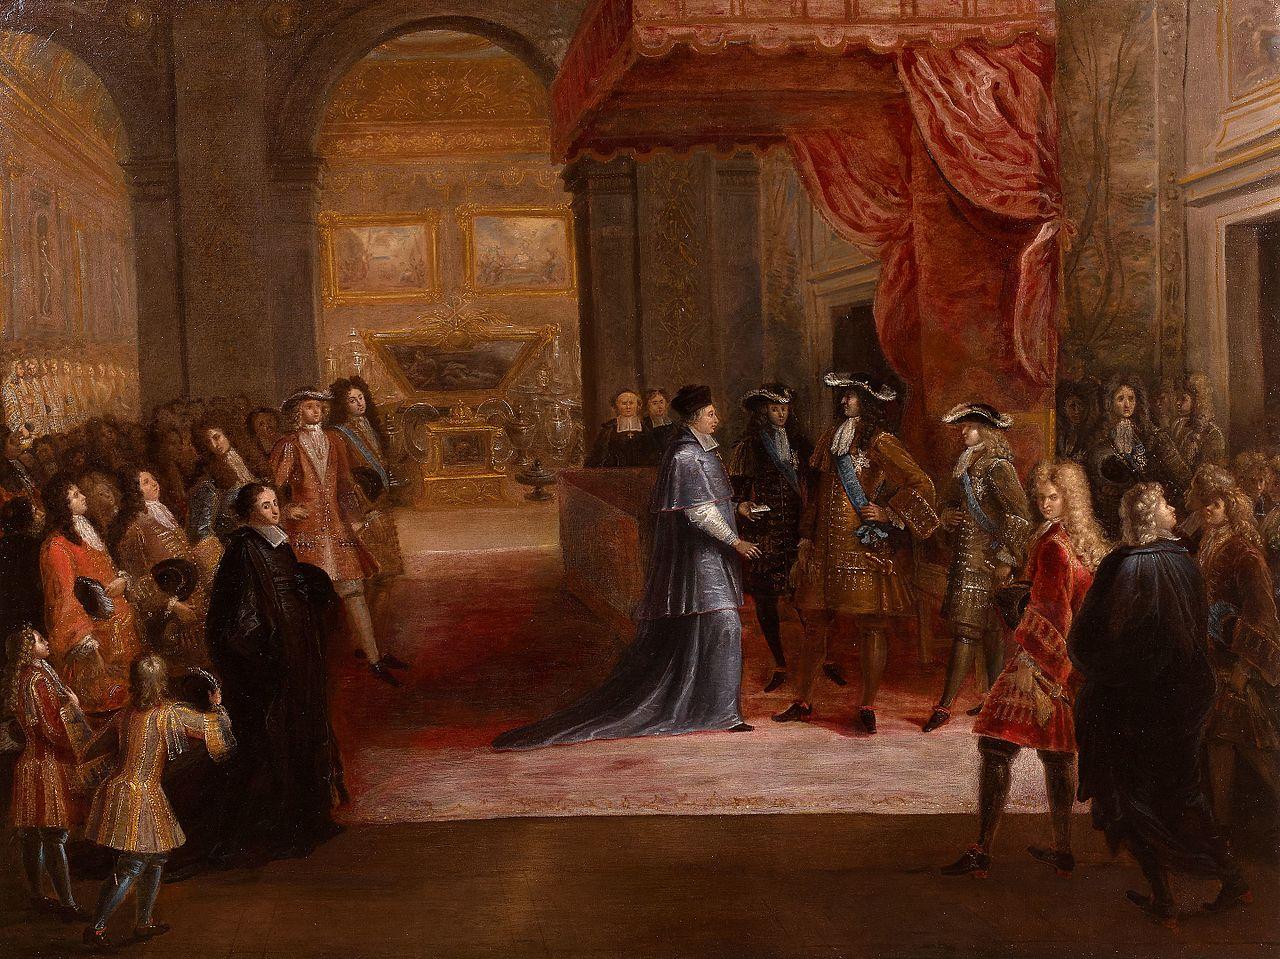 Louis xiv versailles 27 avril 1711 pierre denis martin musée meudon.jpg